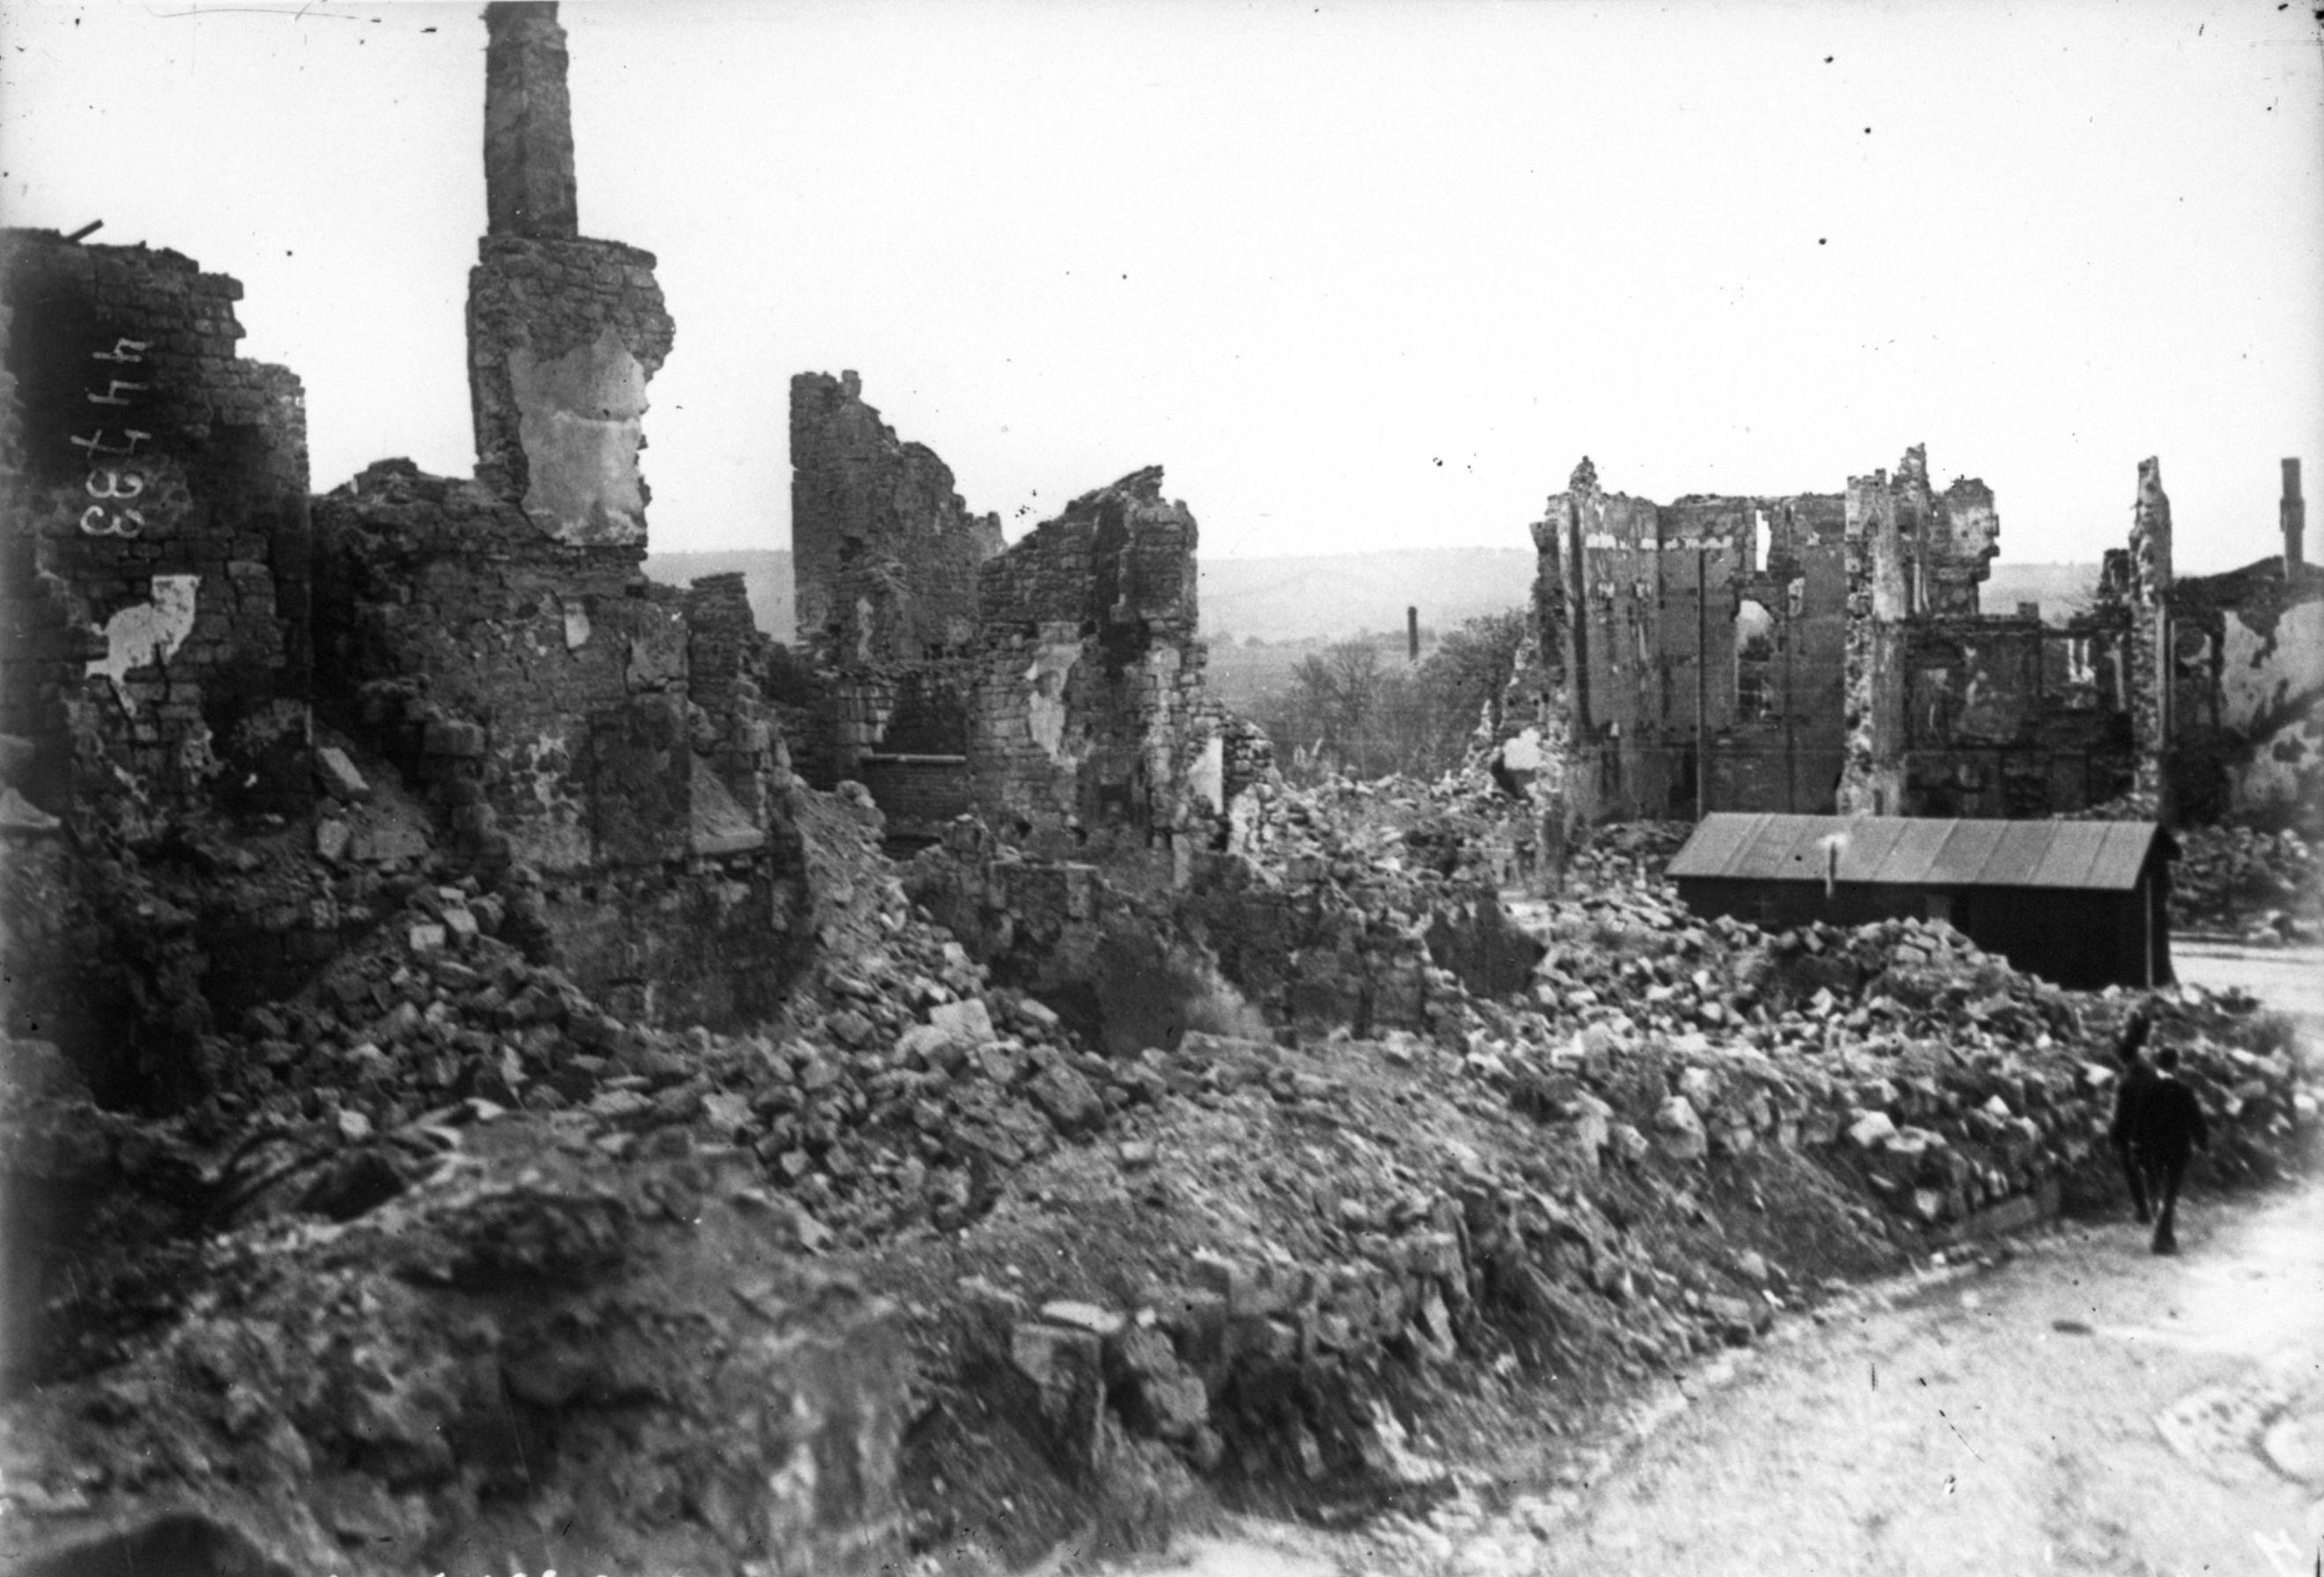 Clermont-en-Argonne-1915_(1).jpg